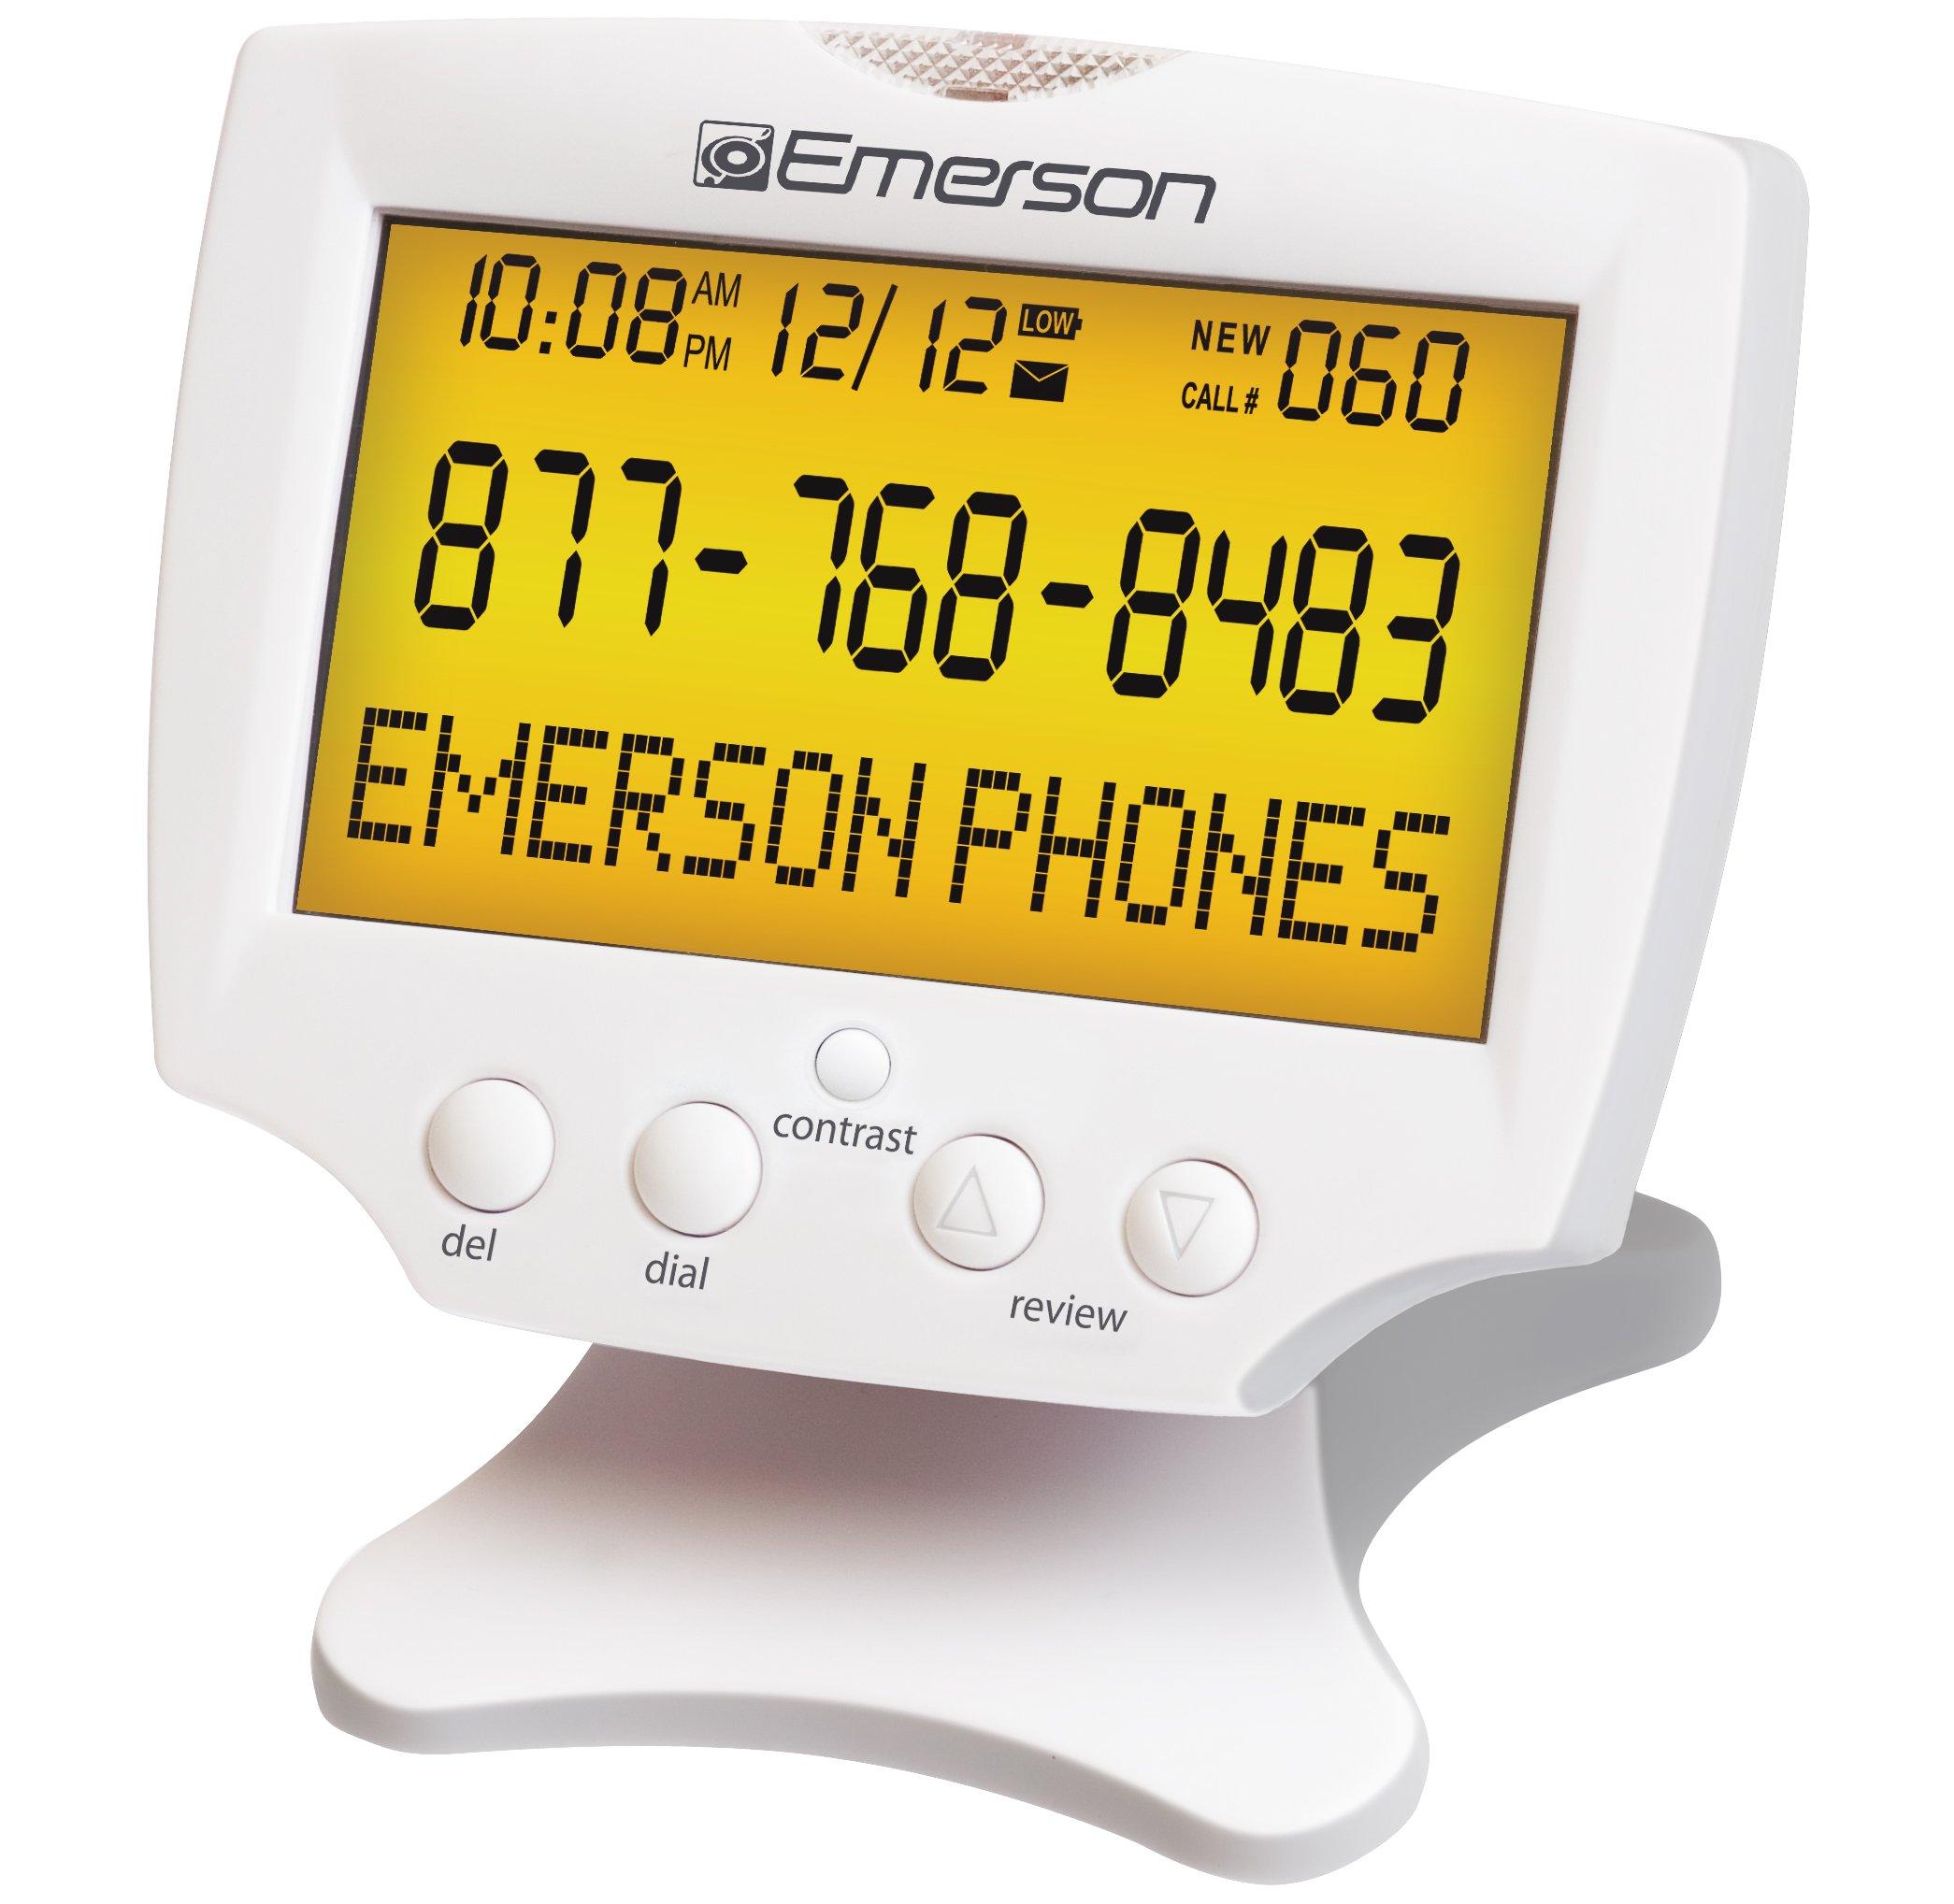 Emerson EM60 Display Talking Numbers